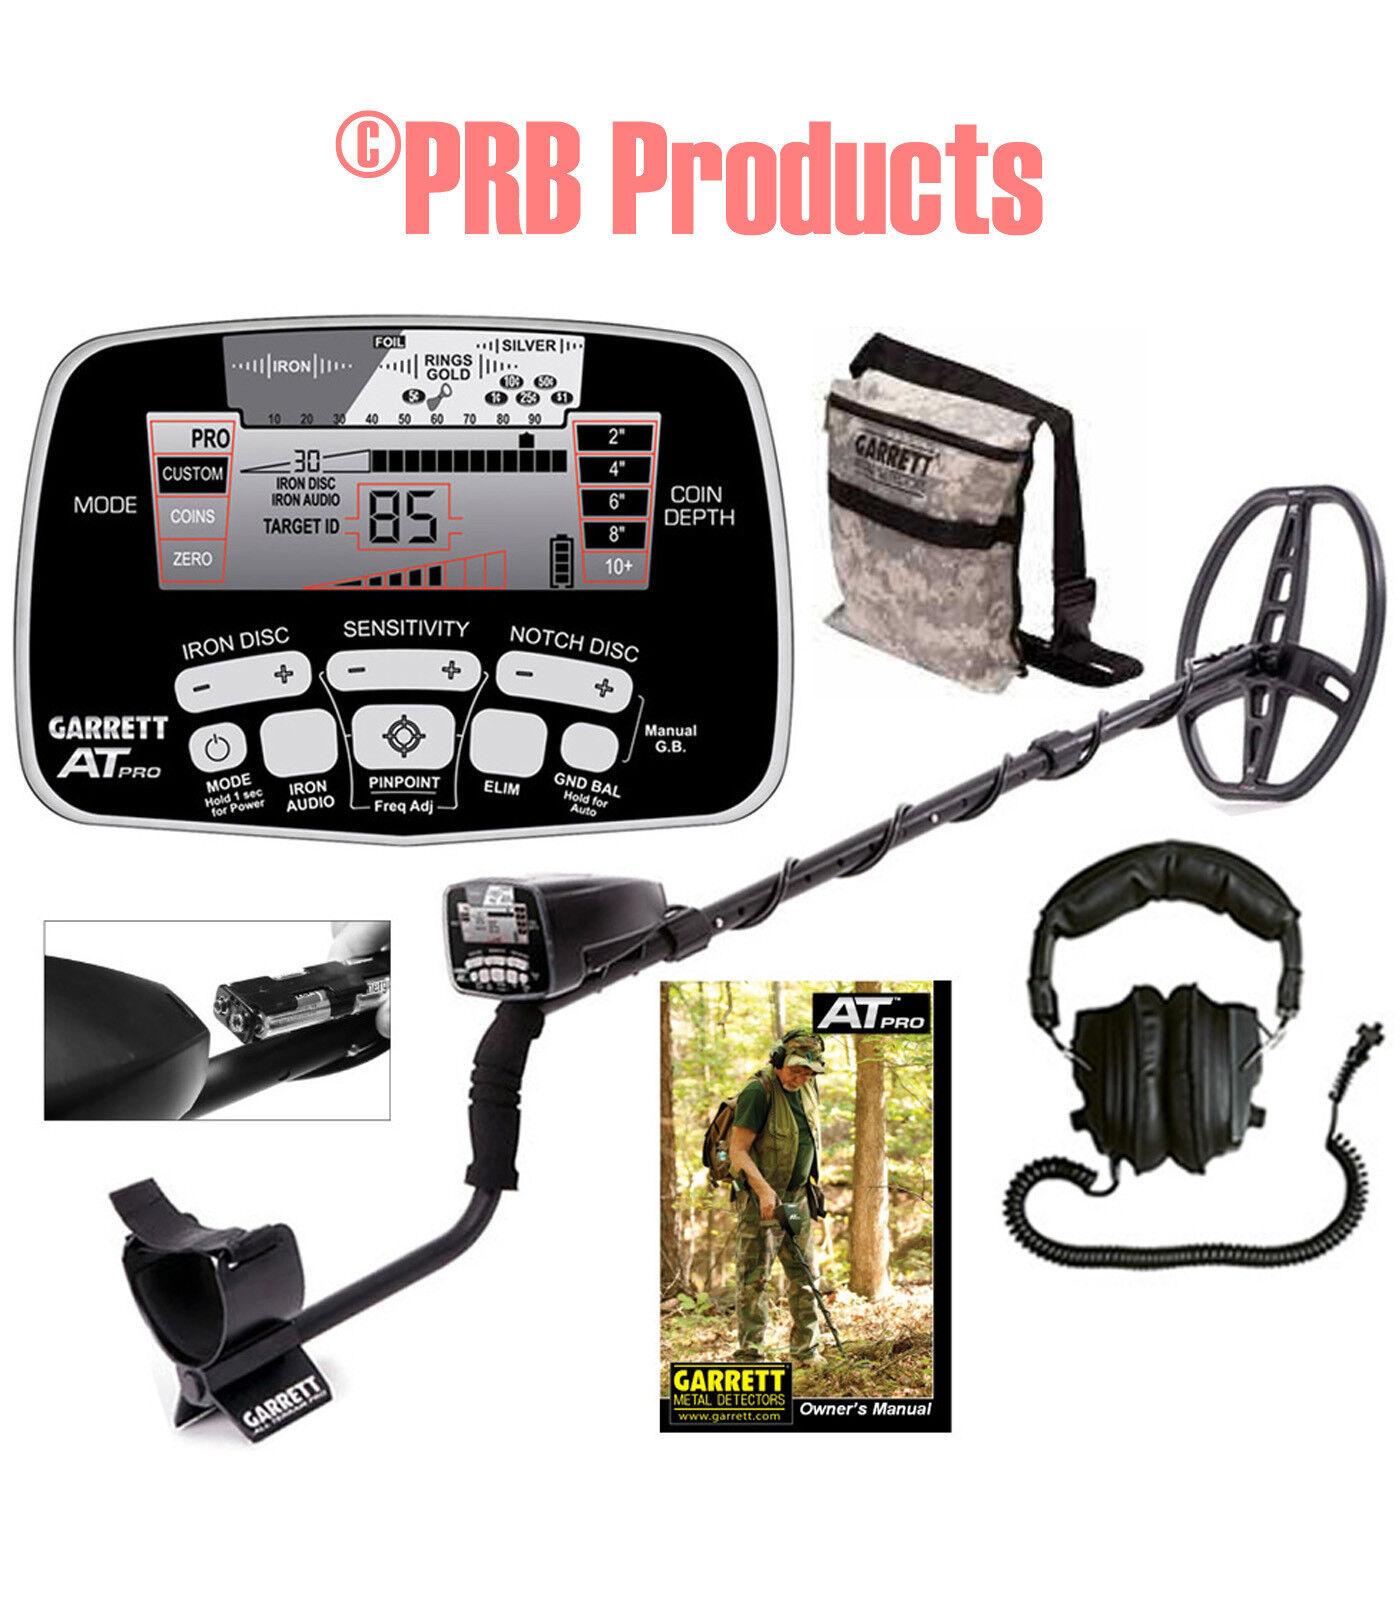 Garrett AT Pro Metal Detector with Land Headphones Camo Pouch 1140460 Garet